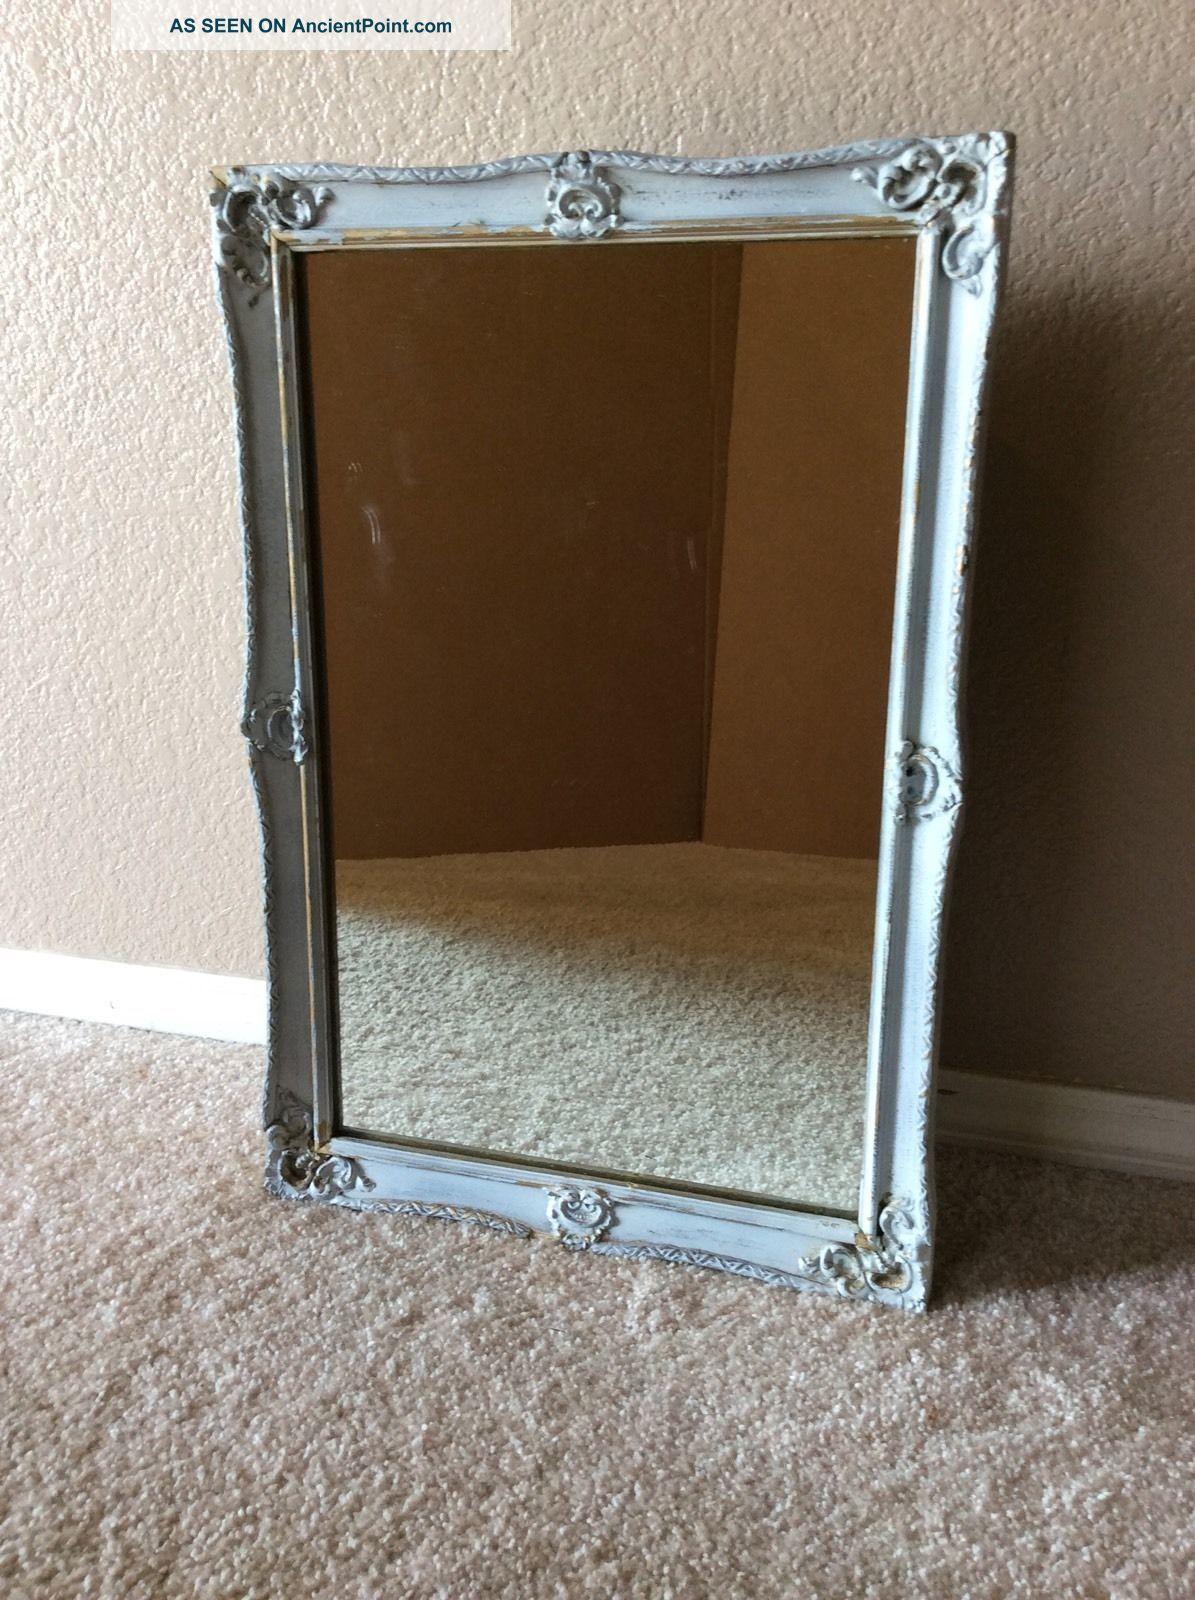 Vintage Antique Wood Frame Surface Mount Metal Medicine Cabinet Mirror Unknown photo